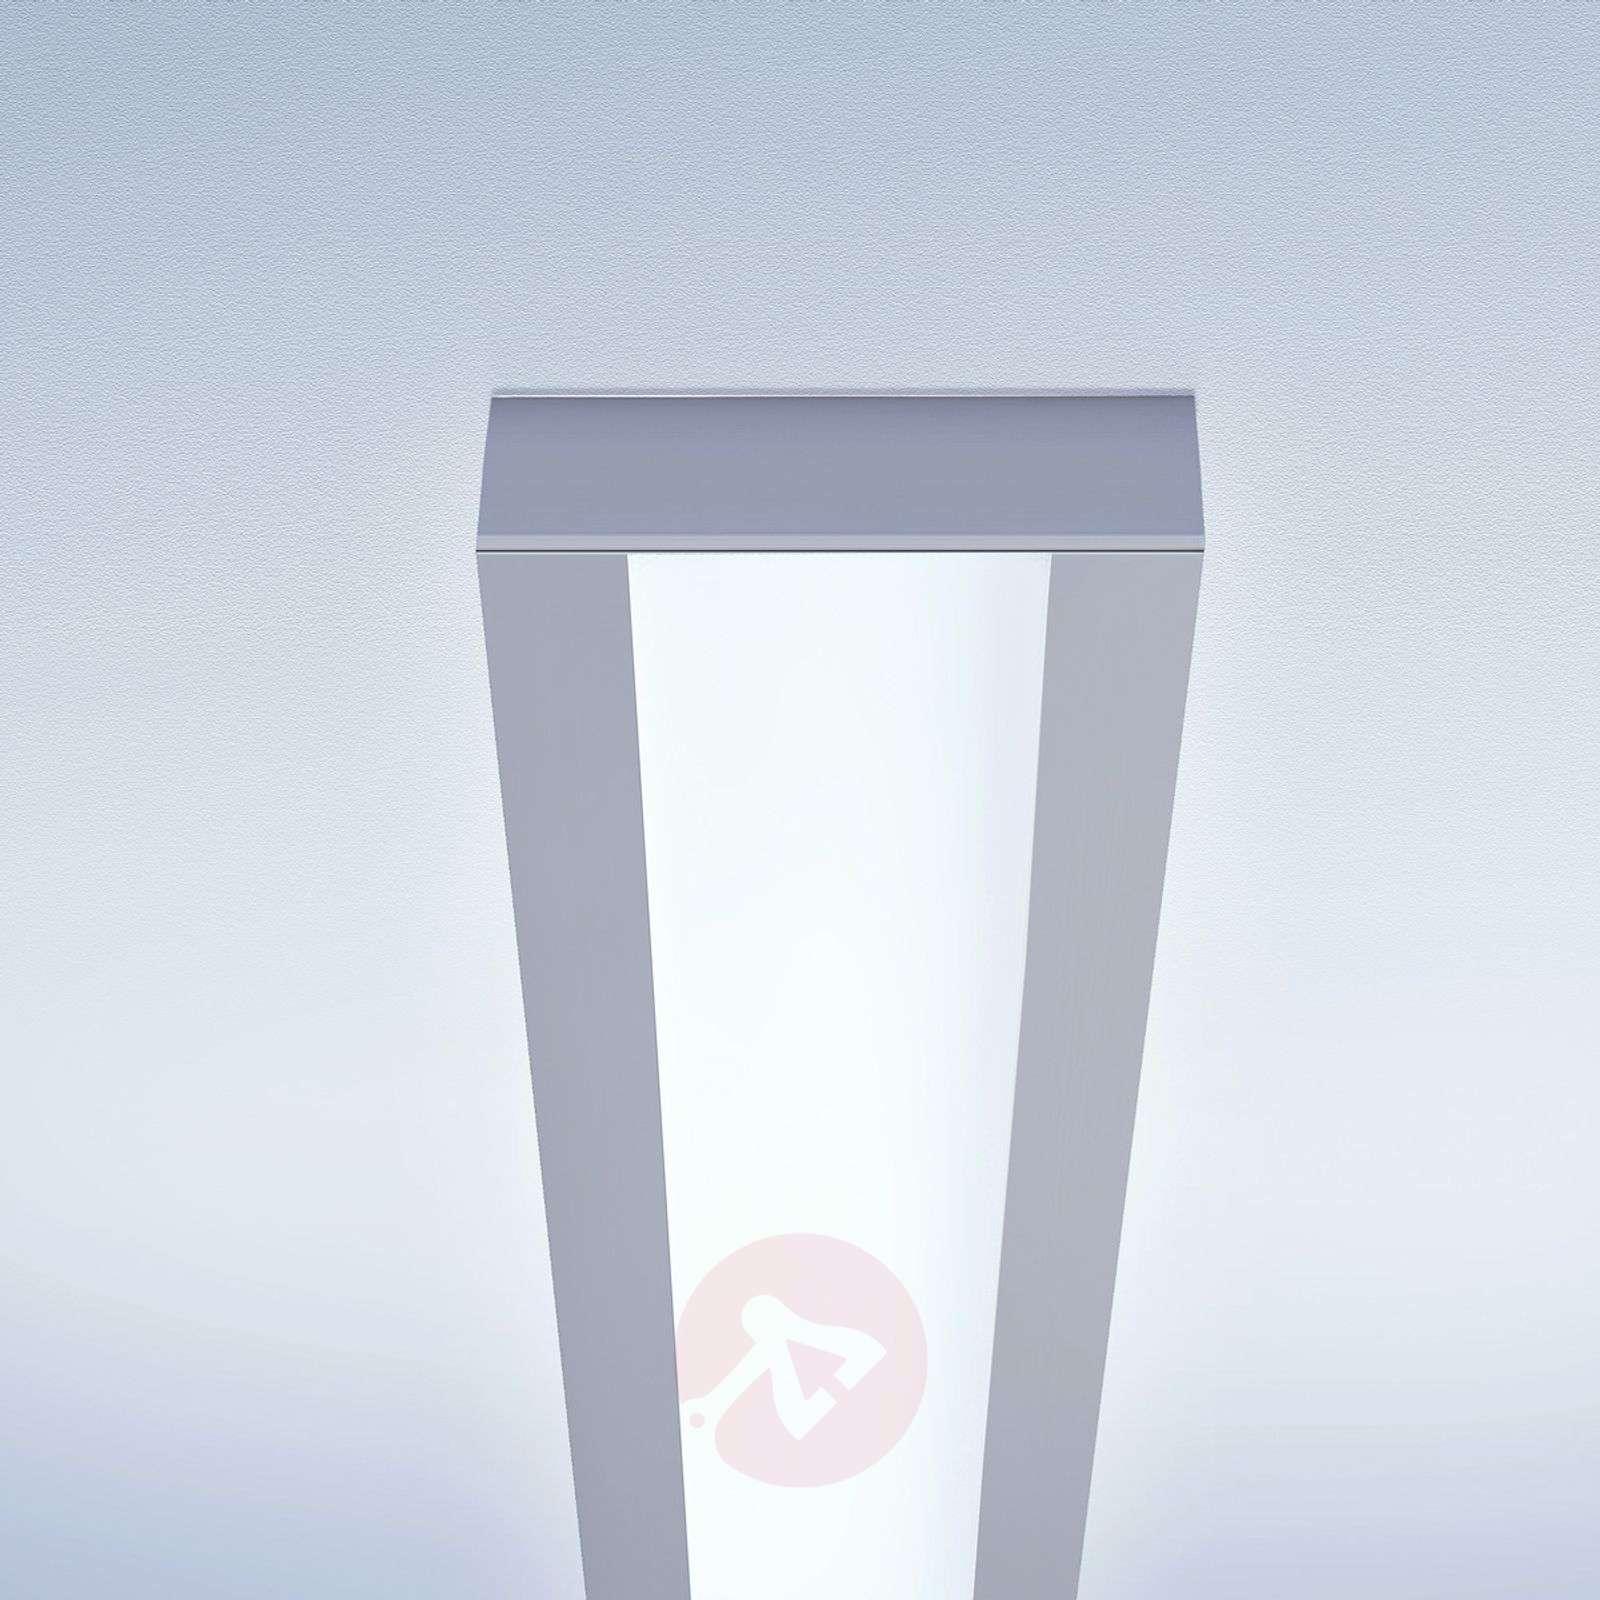 Pinta-asennuskattovalaisin Vison-A2 89cm-6033508-01